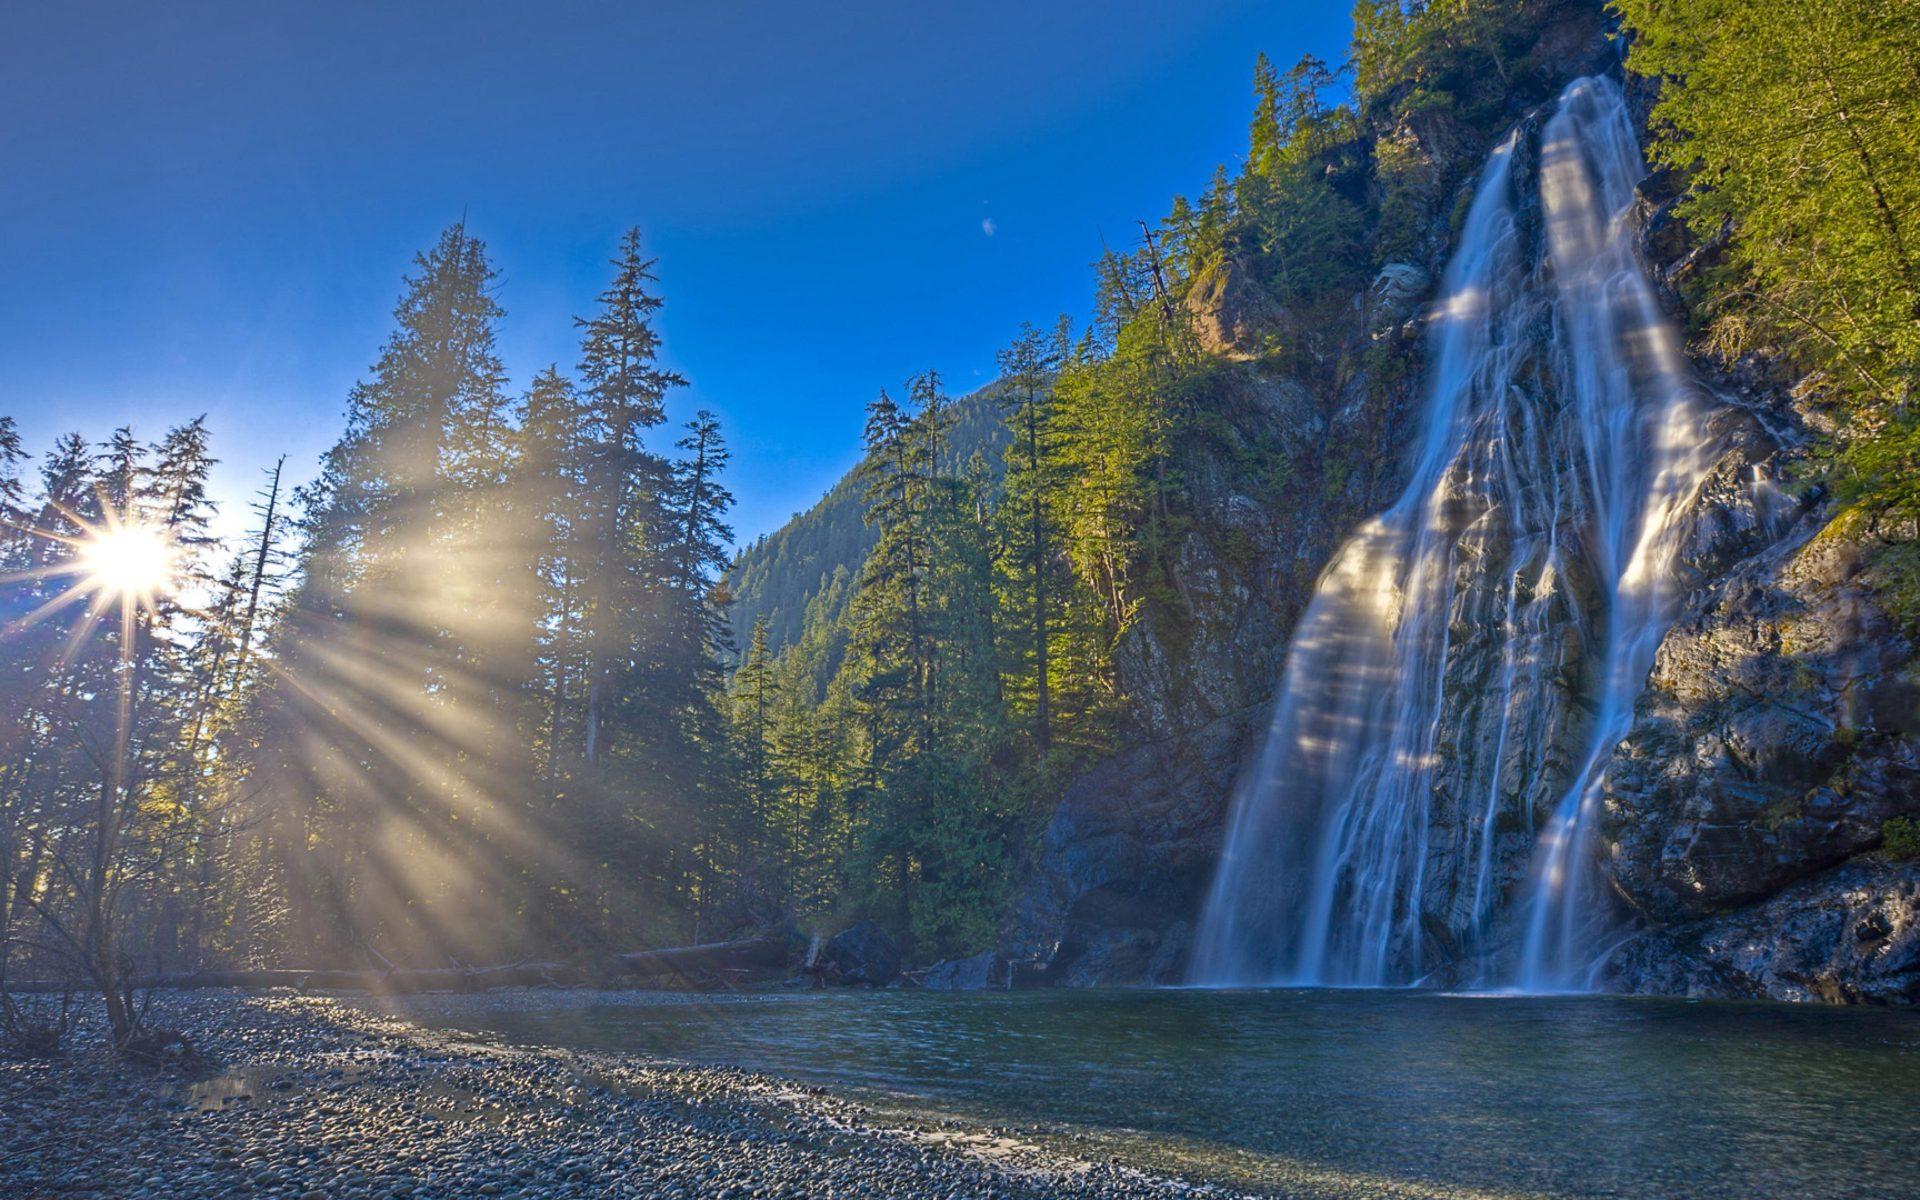 Angel Falls Hd Wallpaper Nature Morning Dawn Sunlight Forest River Waterfall Rock